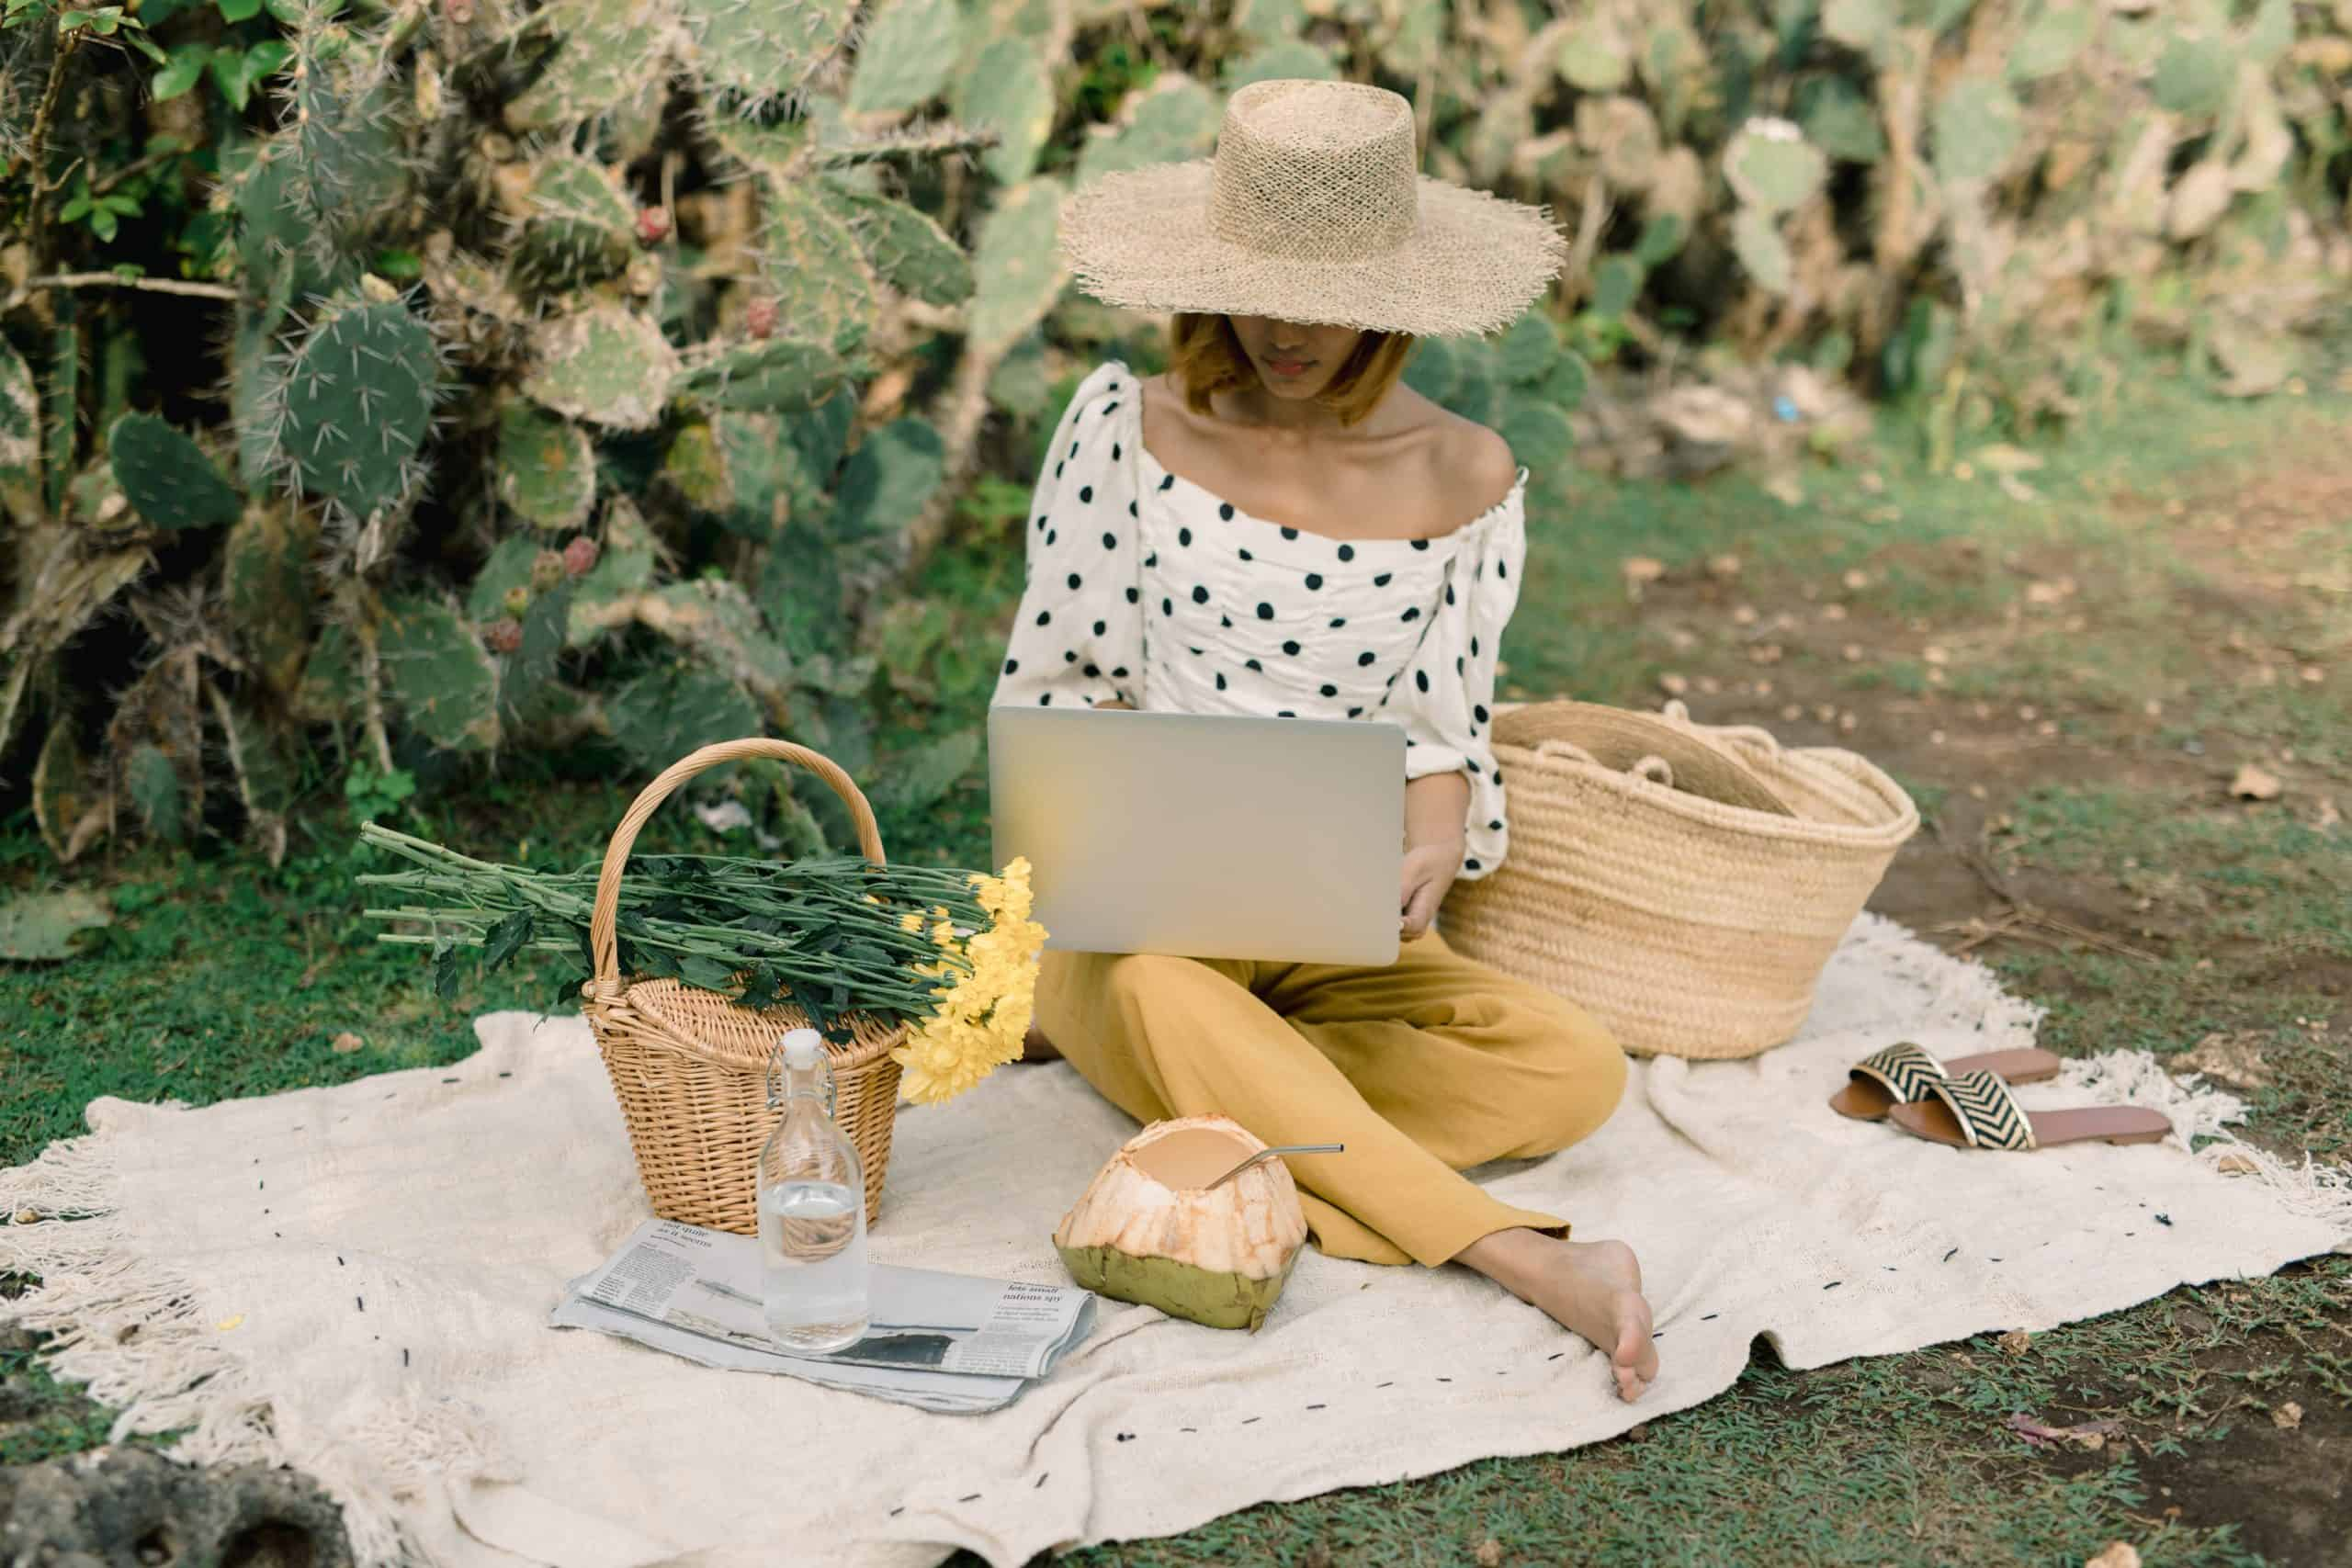 Woman working on laptop outside